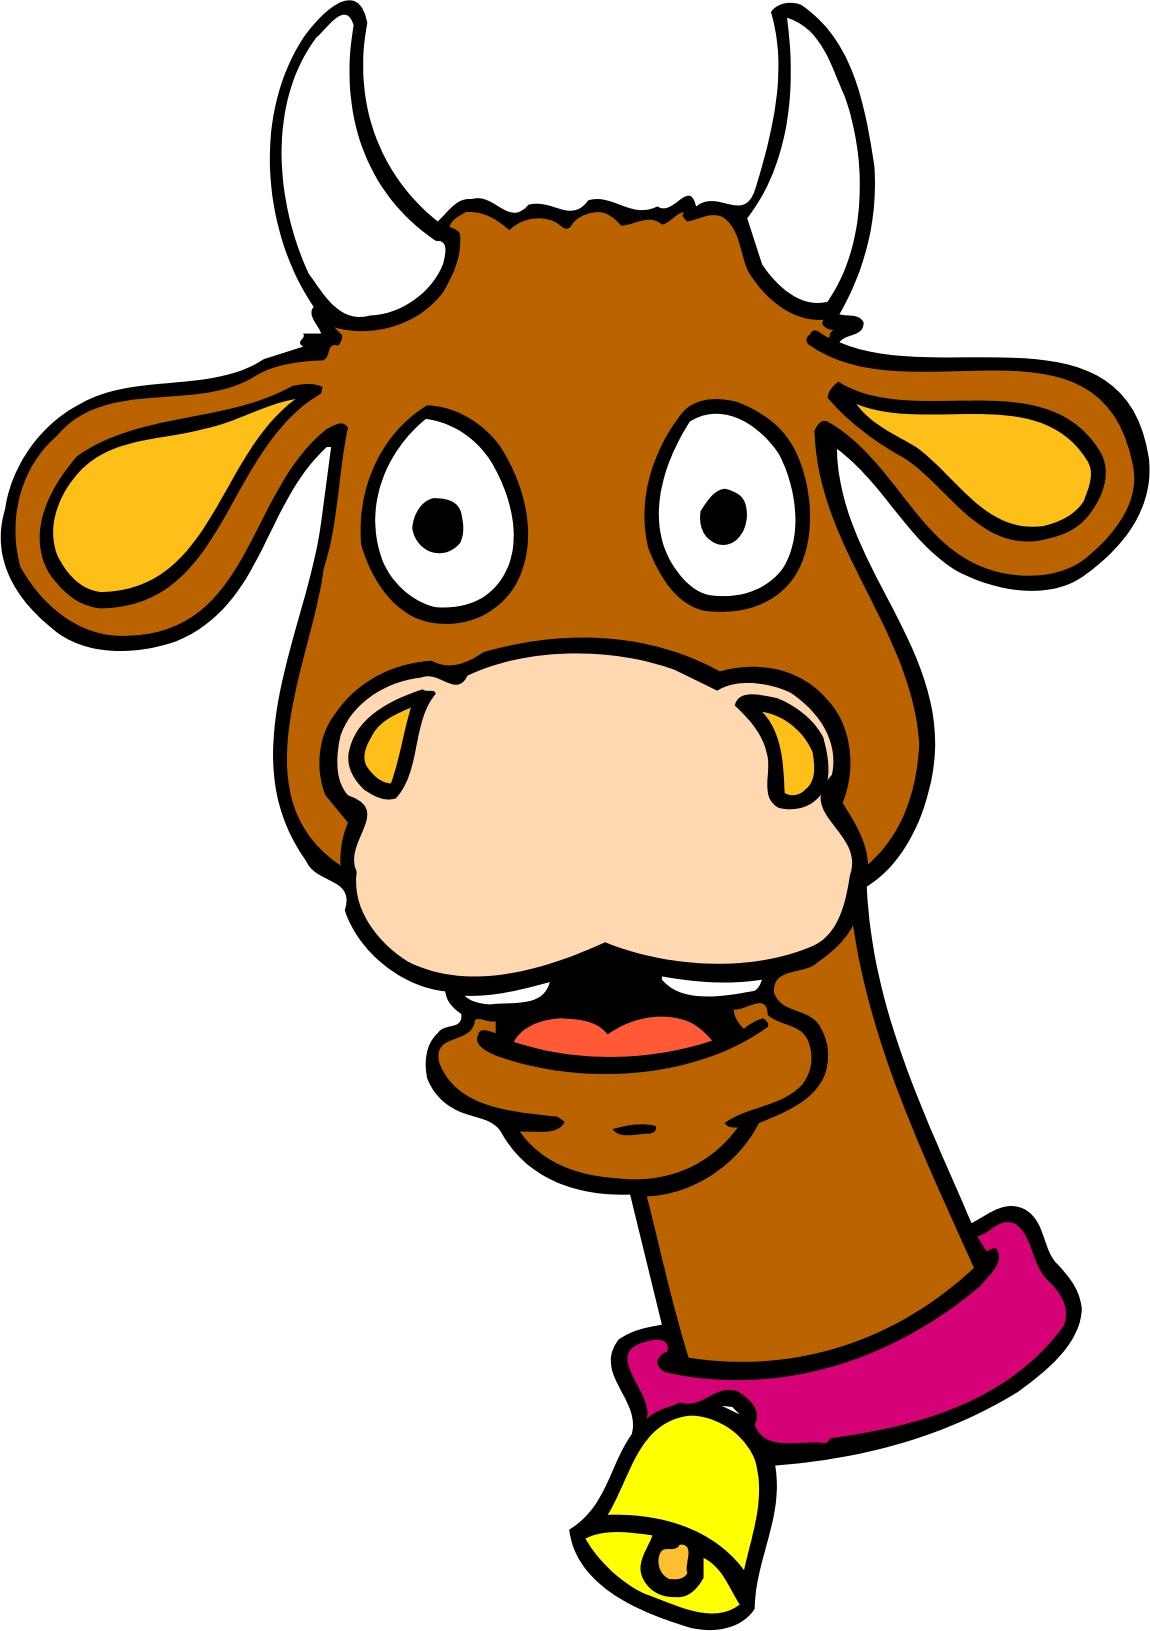 Cow Images Cartoon - ClipArt Best